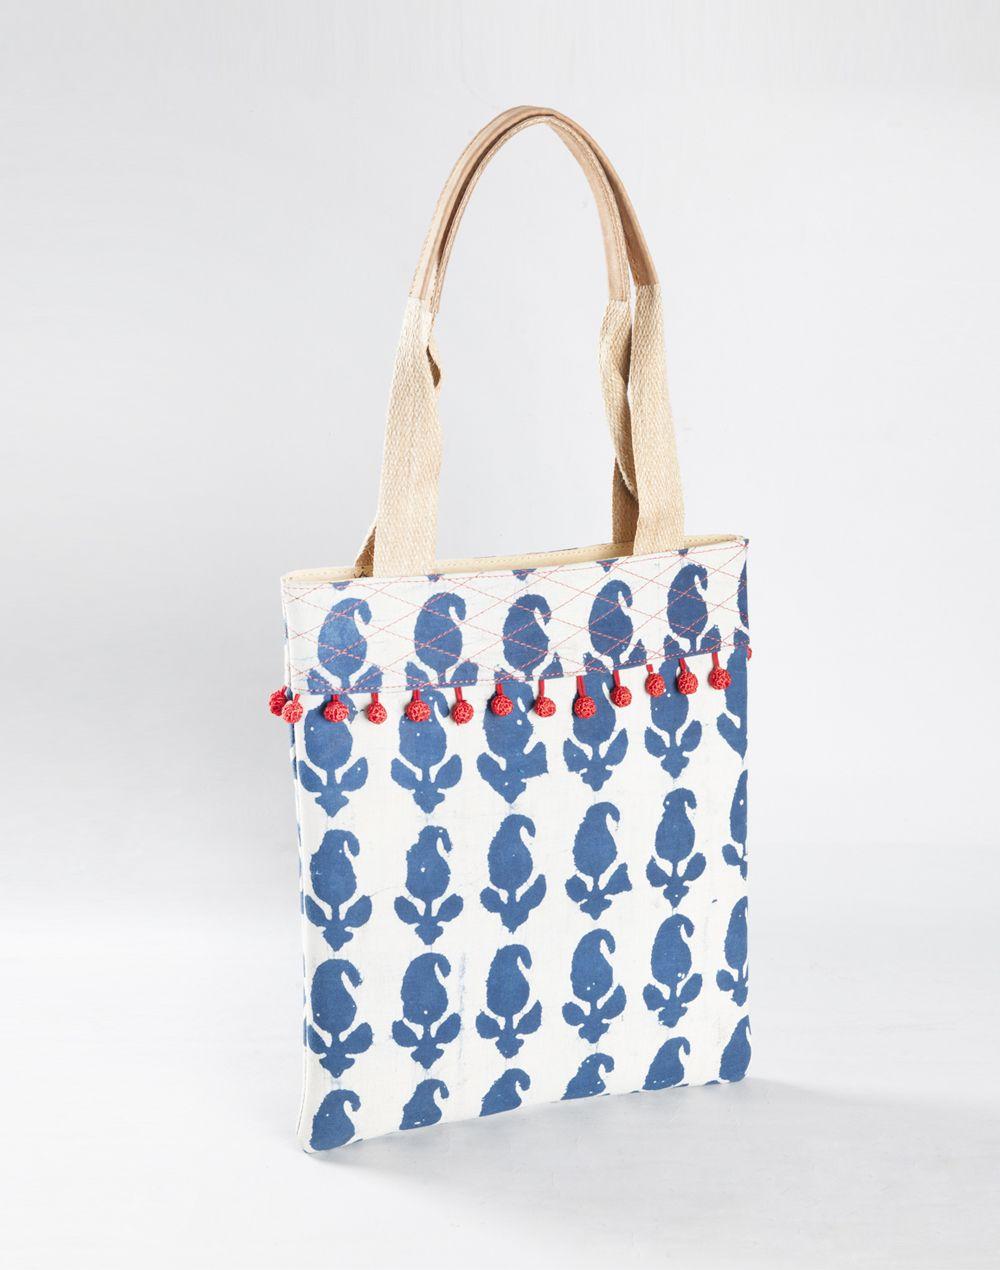 indigo  white  paisley  print  tassel  details  bag  women  fashion   accessories  Fabindia 0ac76945a89cd